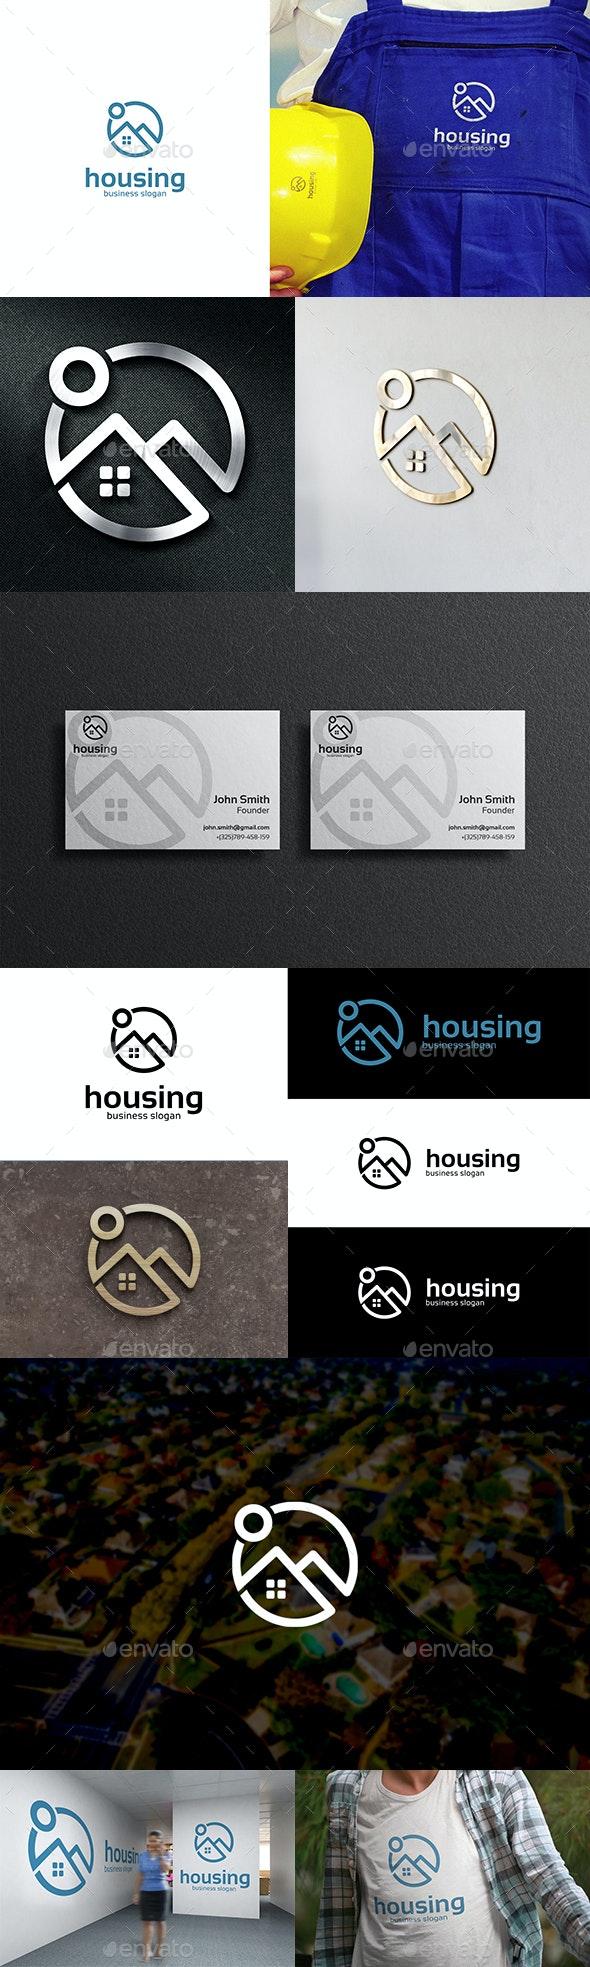 Housing Real Estate Logo Home or House Symbol - Buildings Logo Templates